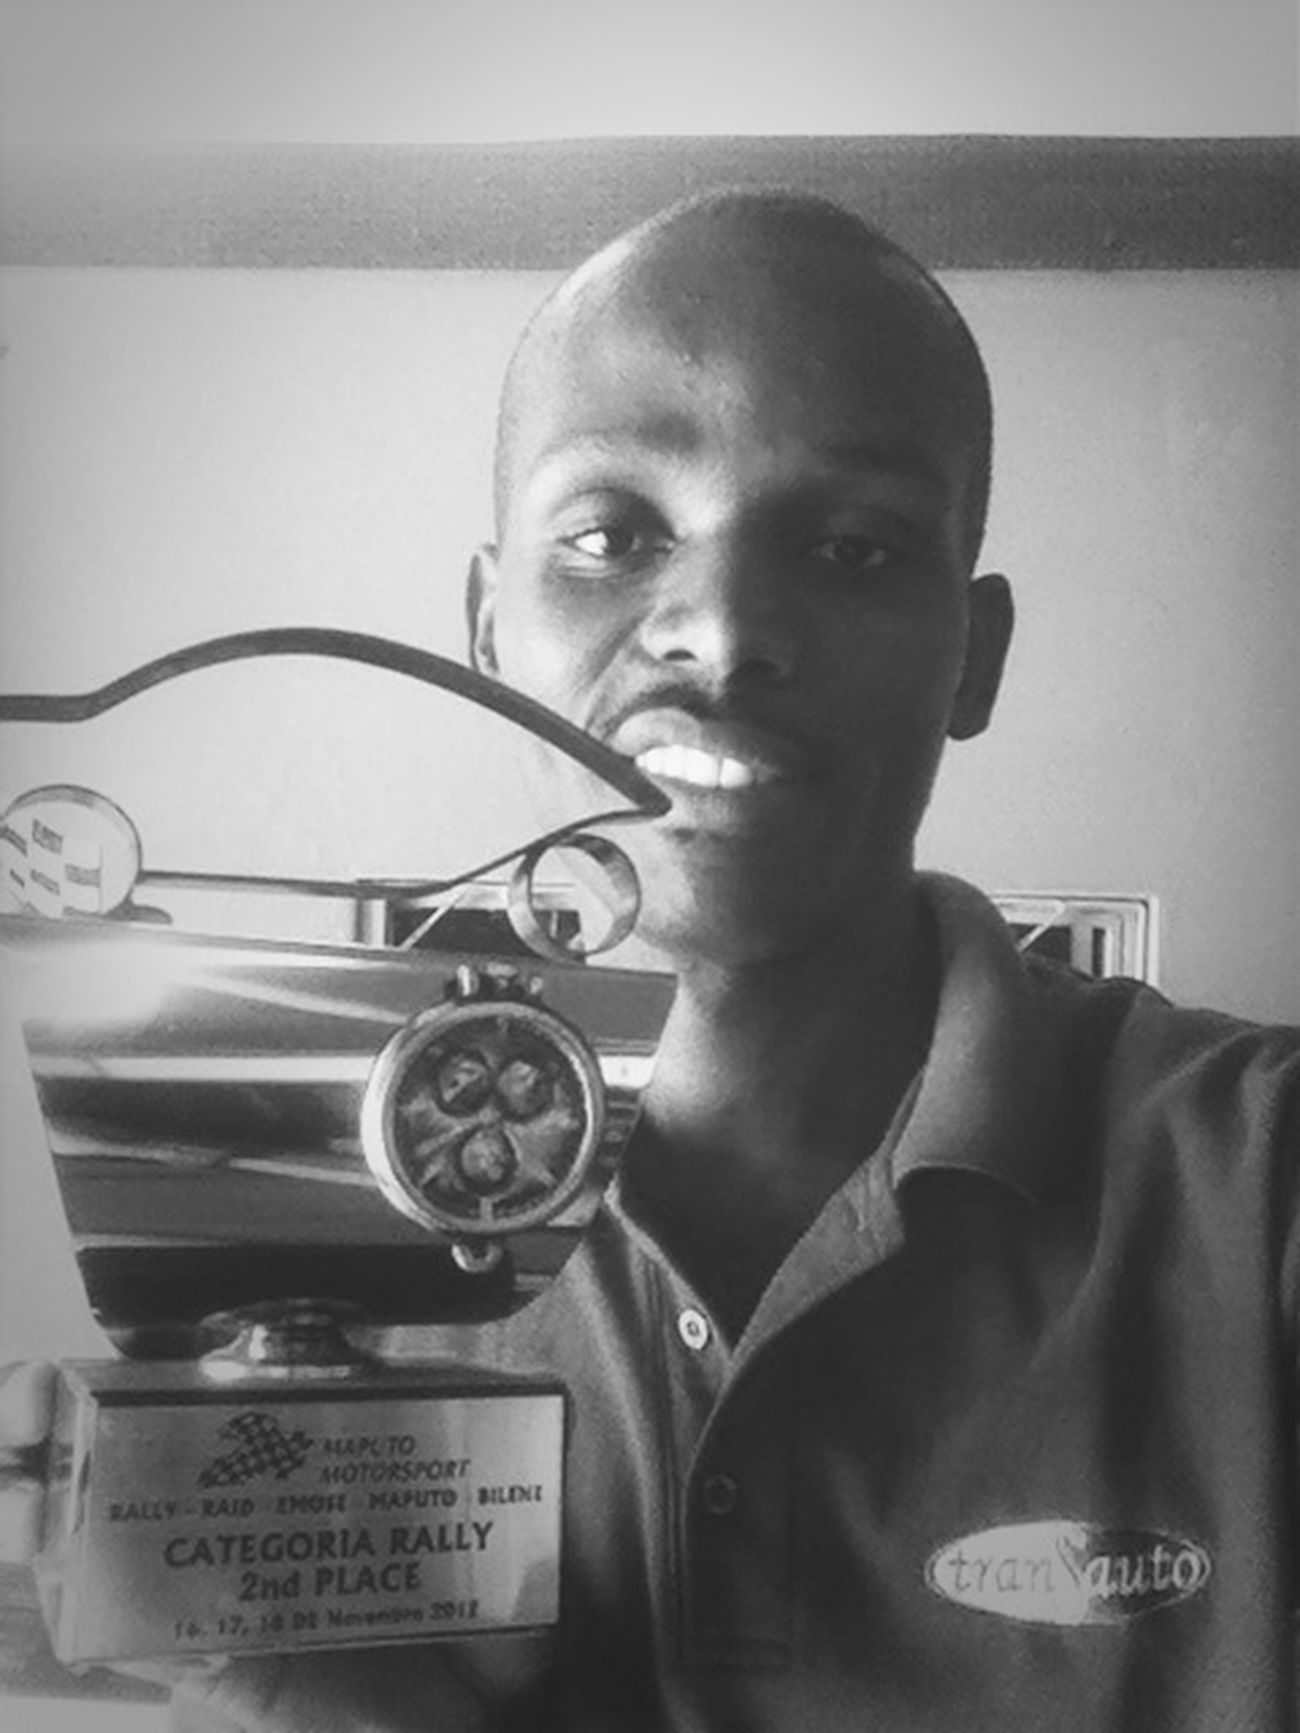 My prize...